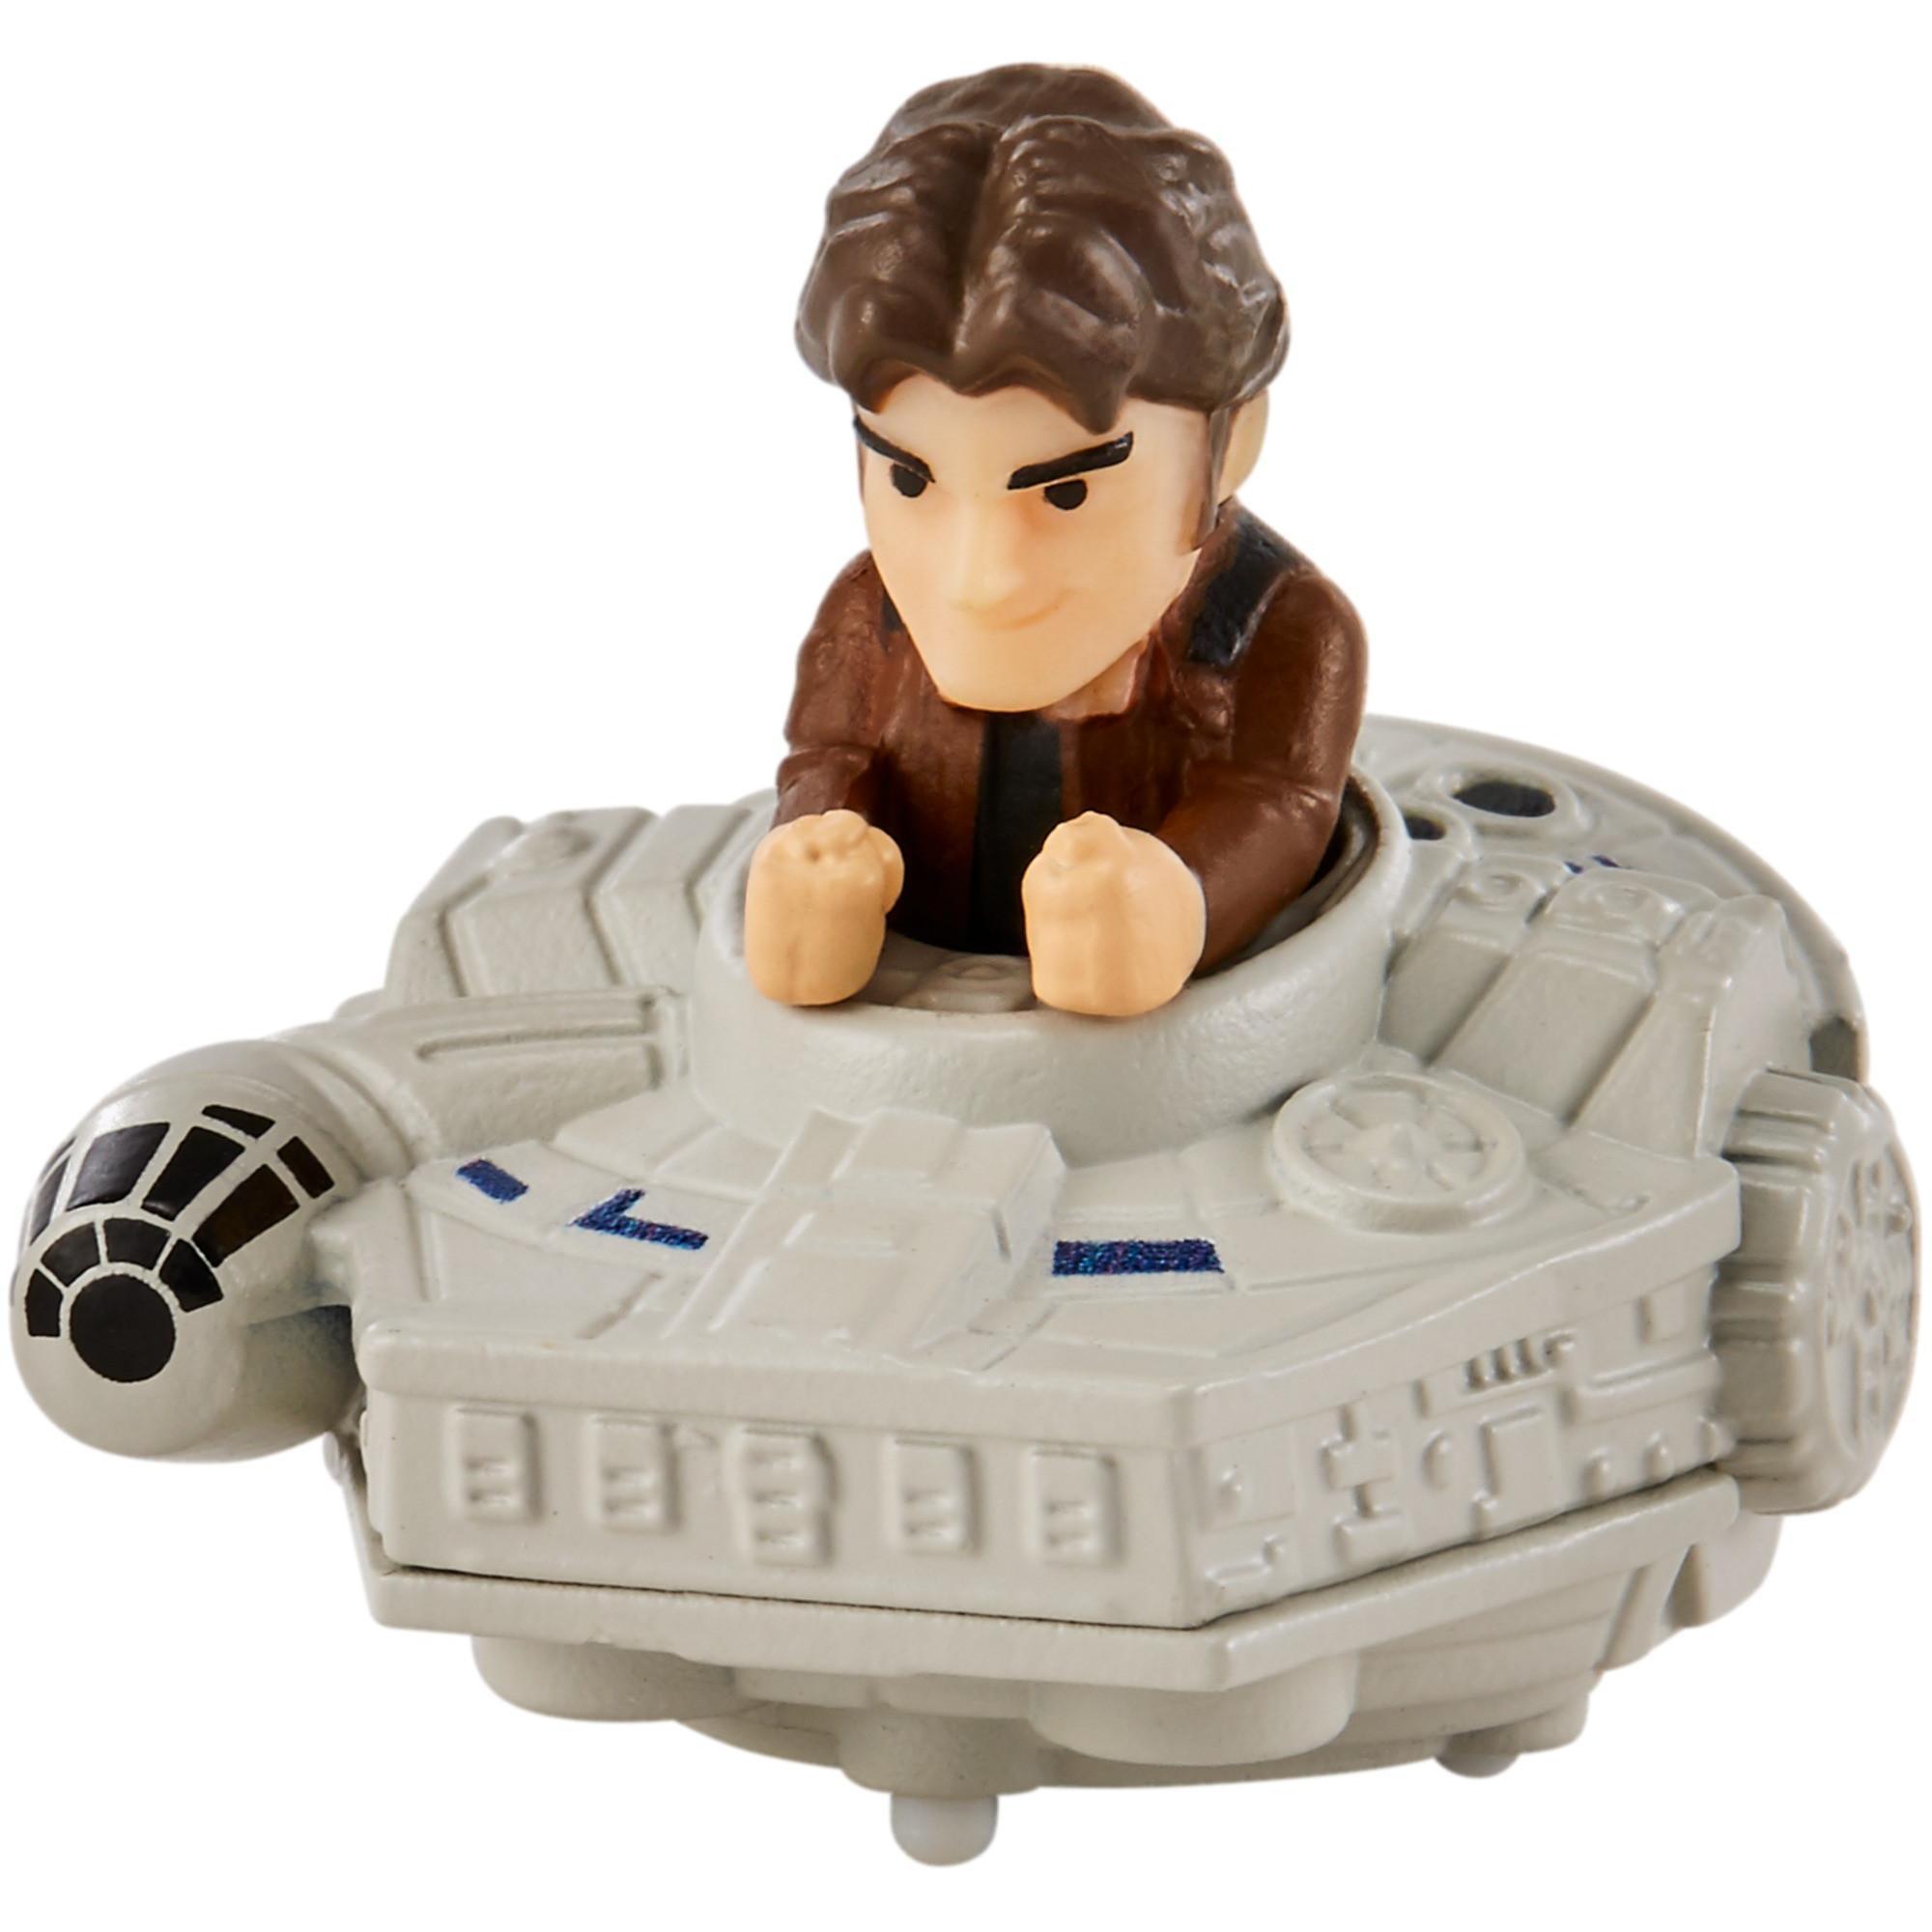 Solo: ASWS Han Solo Millennium Falcon Battle Roller Toy 2